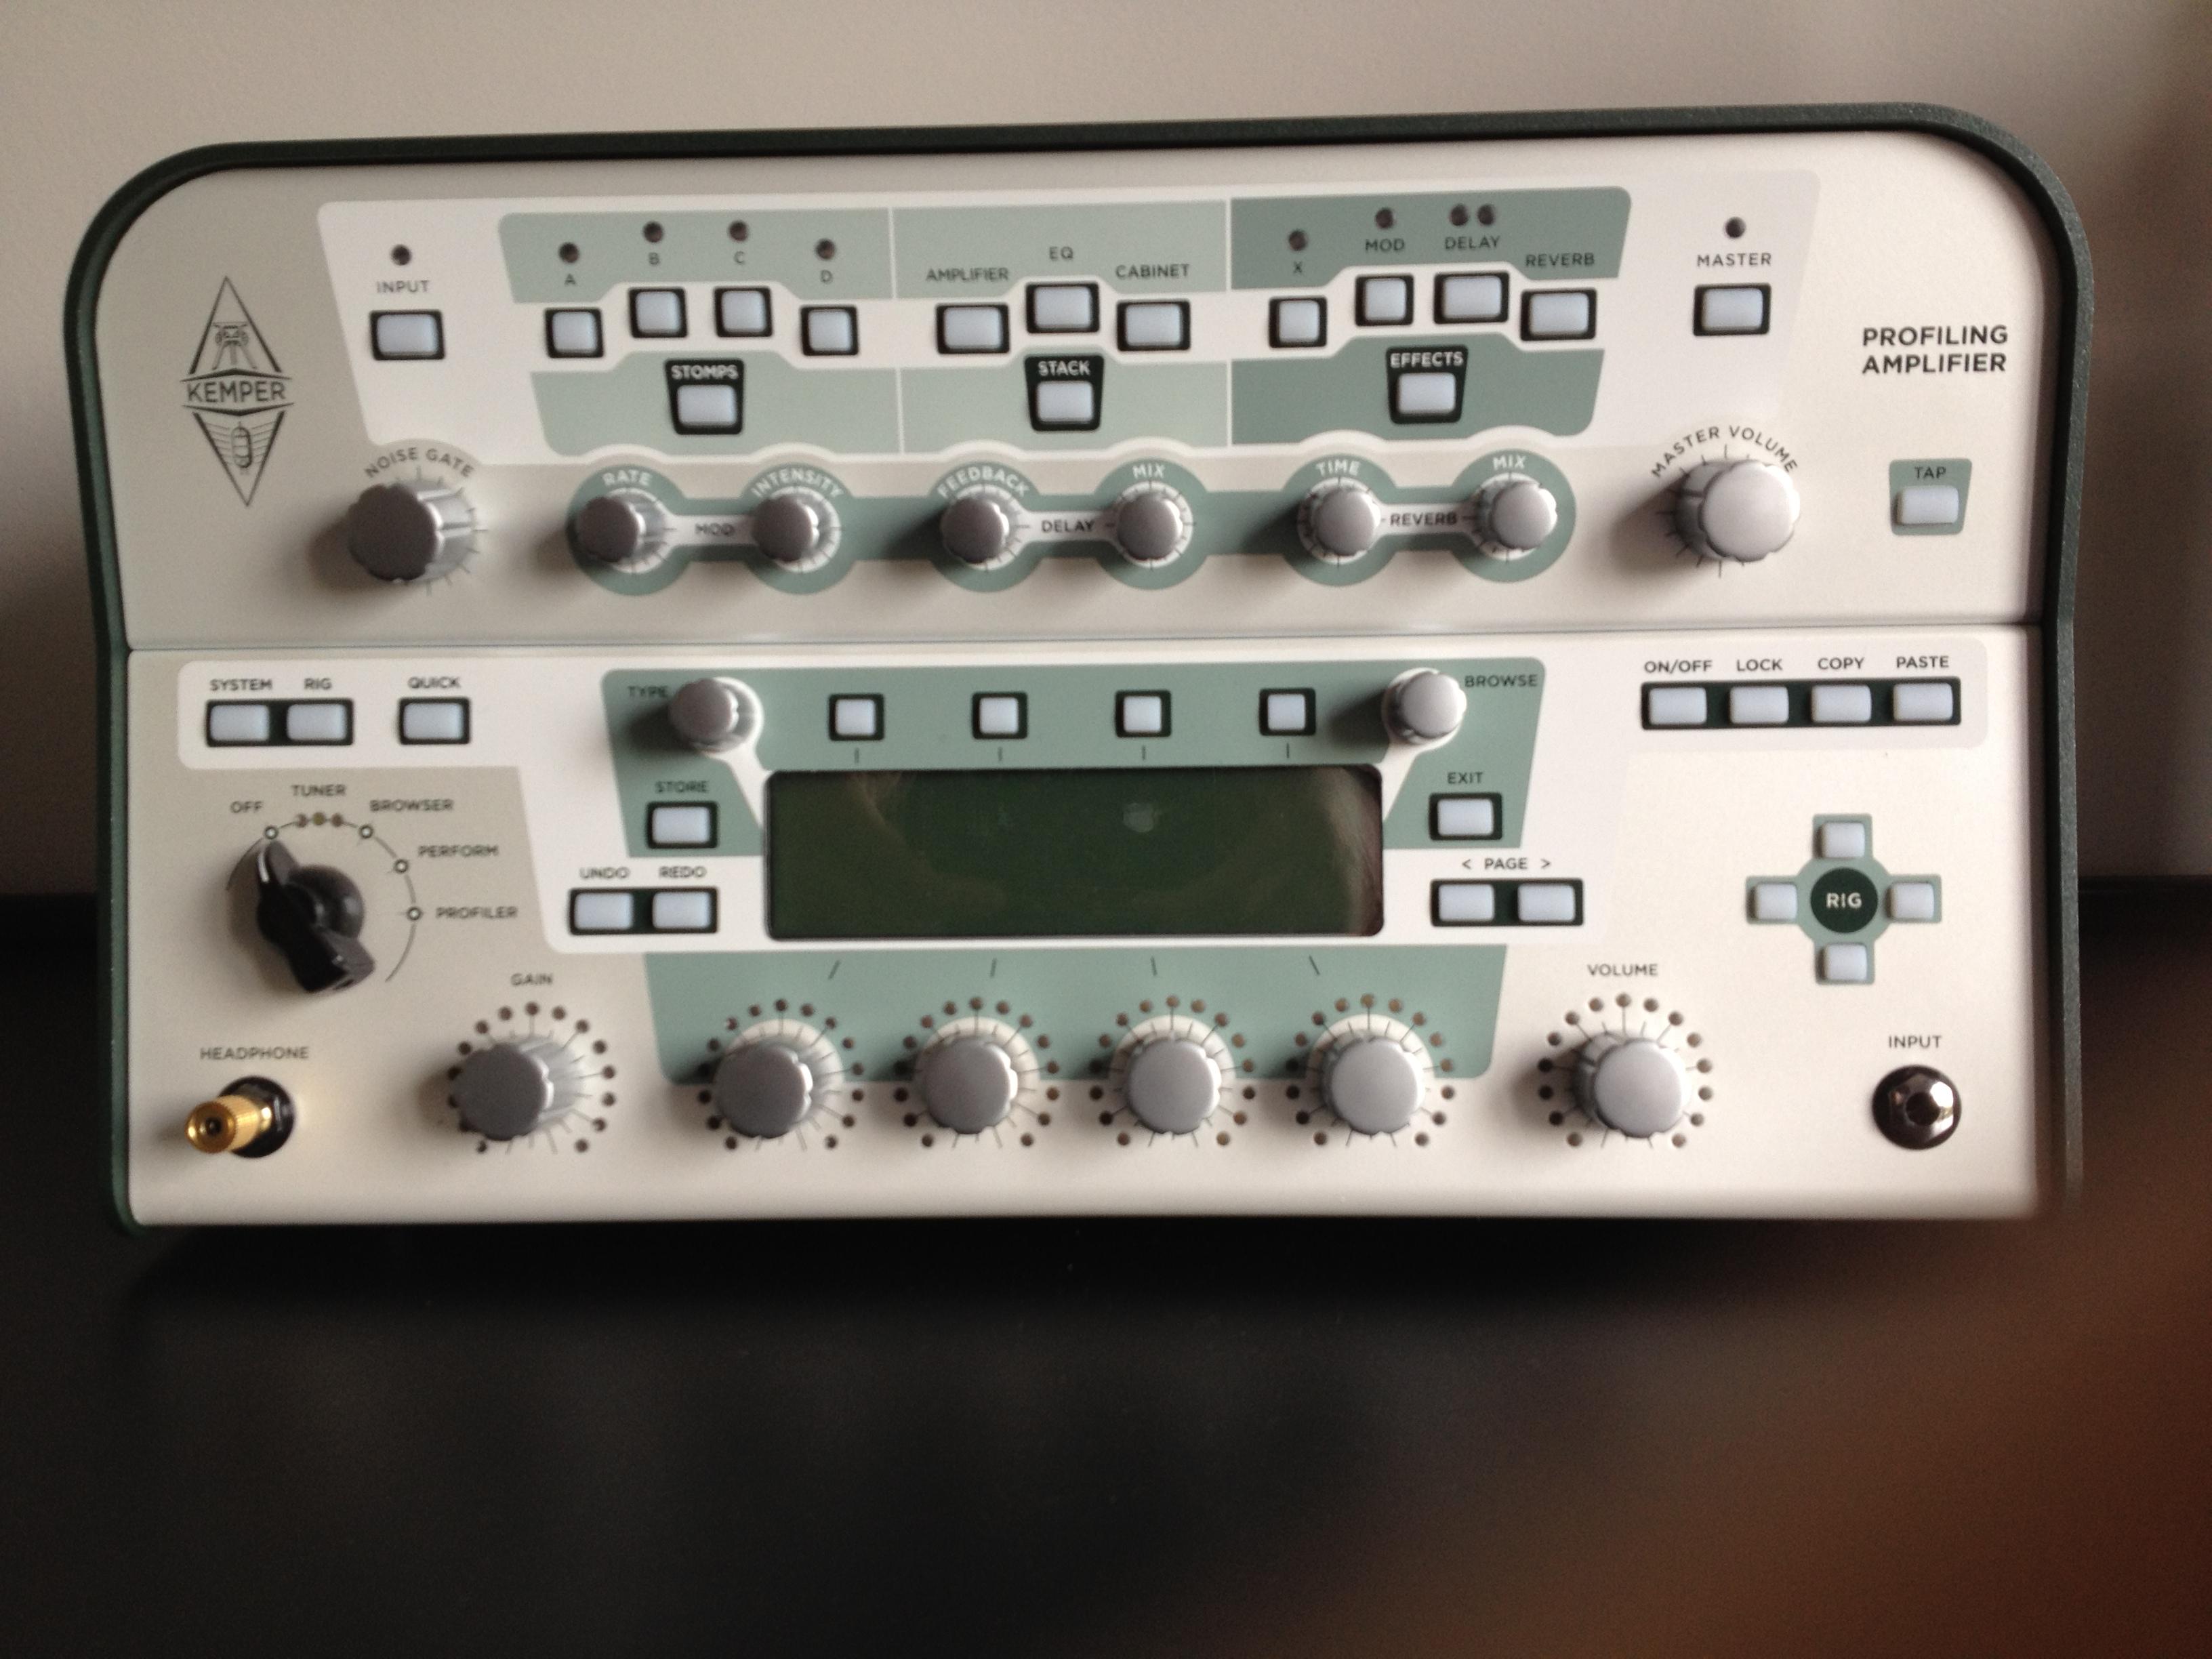 kemper profiling amplifier image 390150 audiofanzine. Black Bedroom Furniture Sets. Home Design Ideas